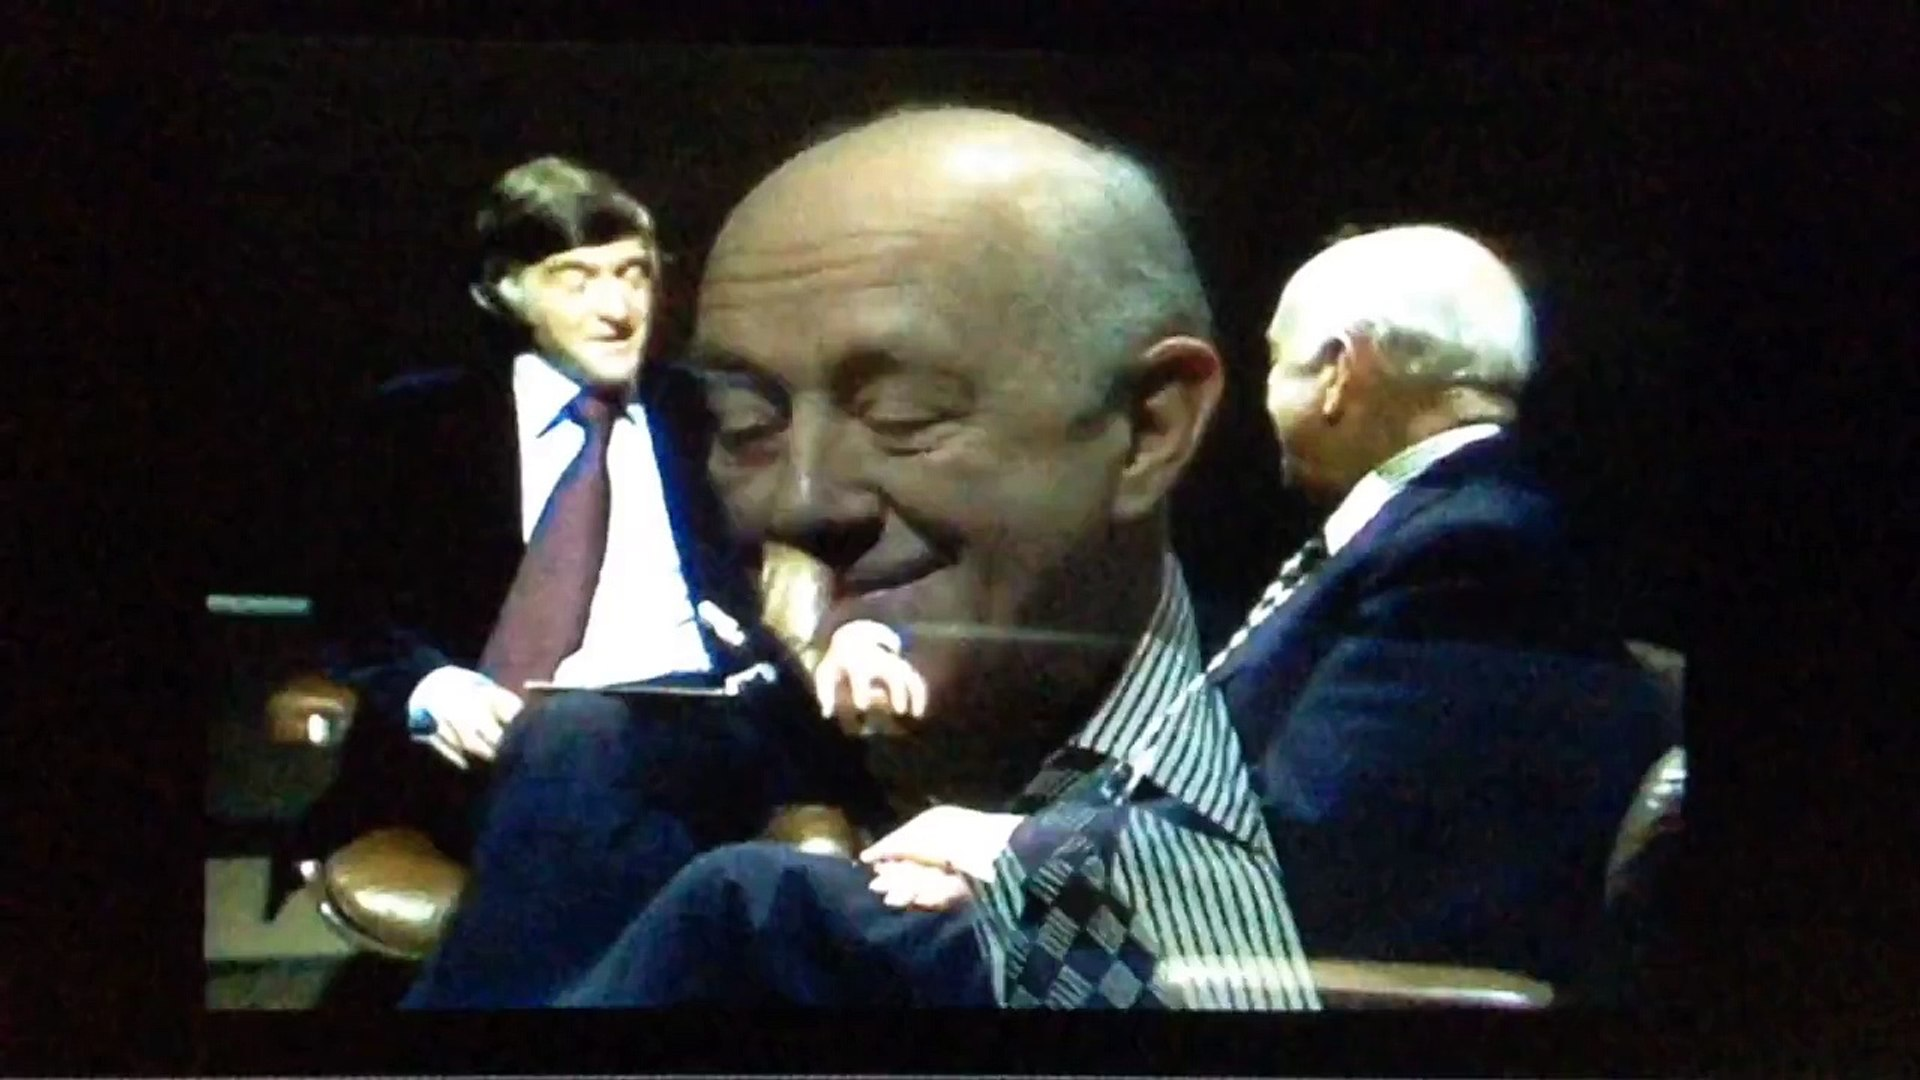 ALEC GUINNESS - 1977 FIRST STAR WARS INTERVIEW - MICHAEL PARKINSON BBC TV